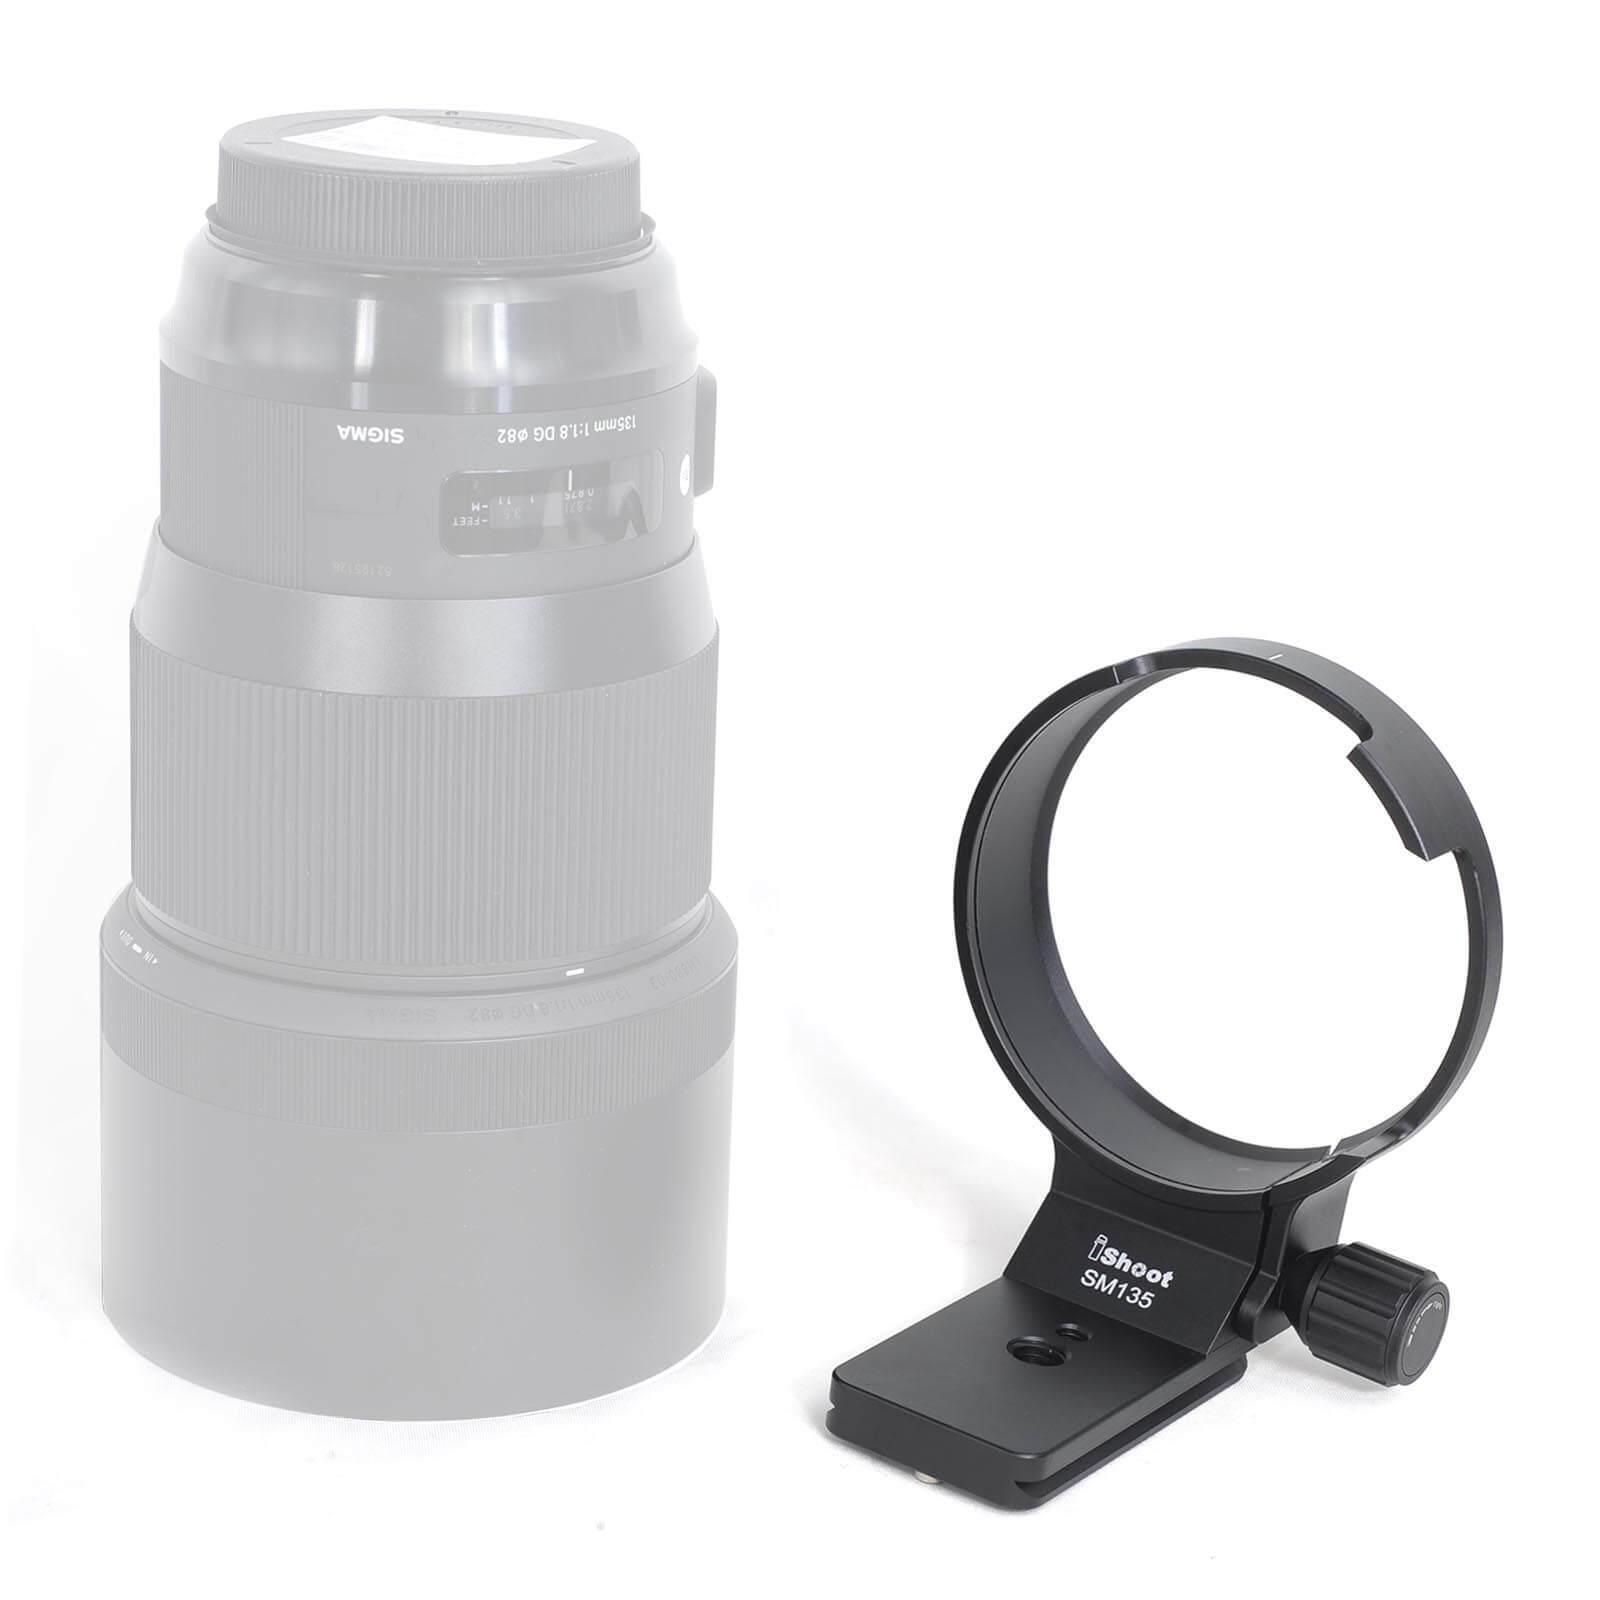 Tripod Mount Ring Lens Collar for Sigma 135mm f/1.8 DG HSM Art (for Canon Nikon)